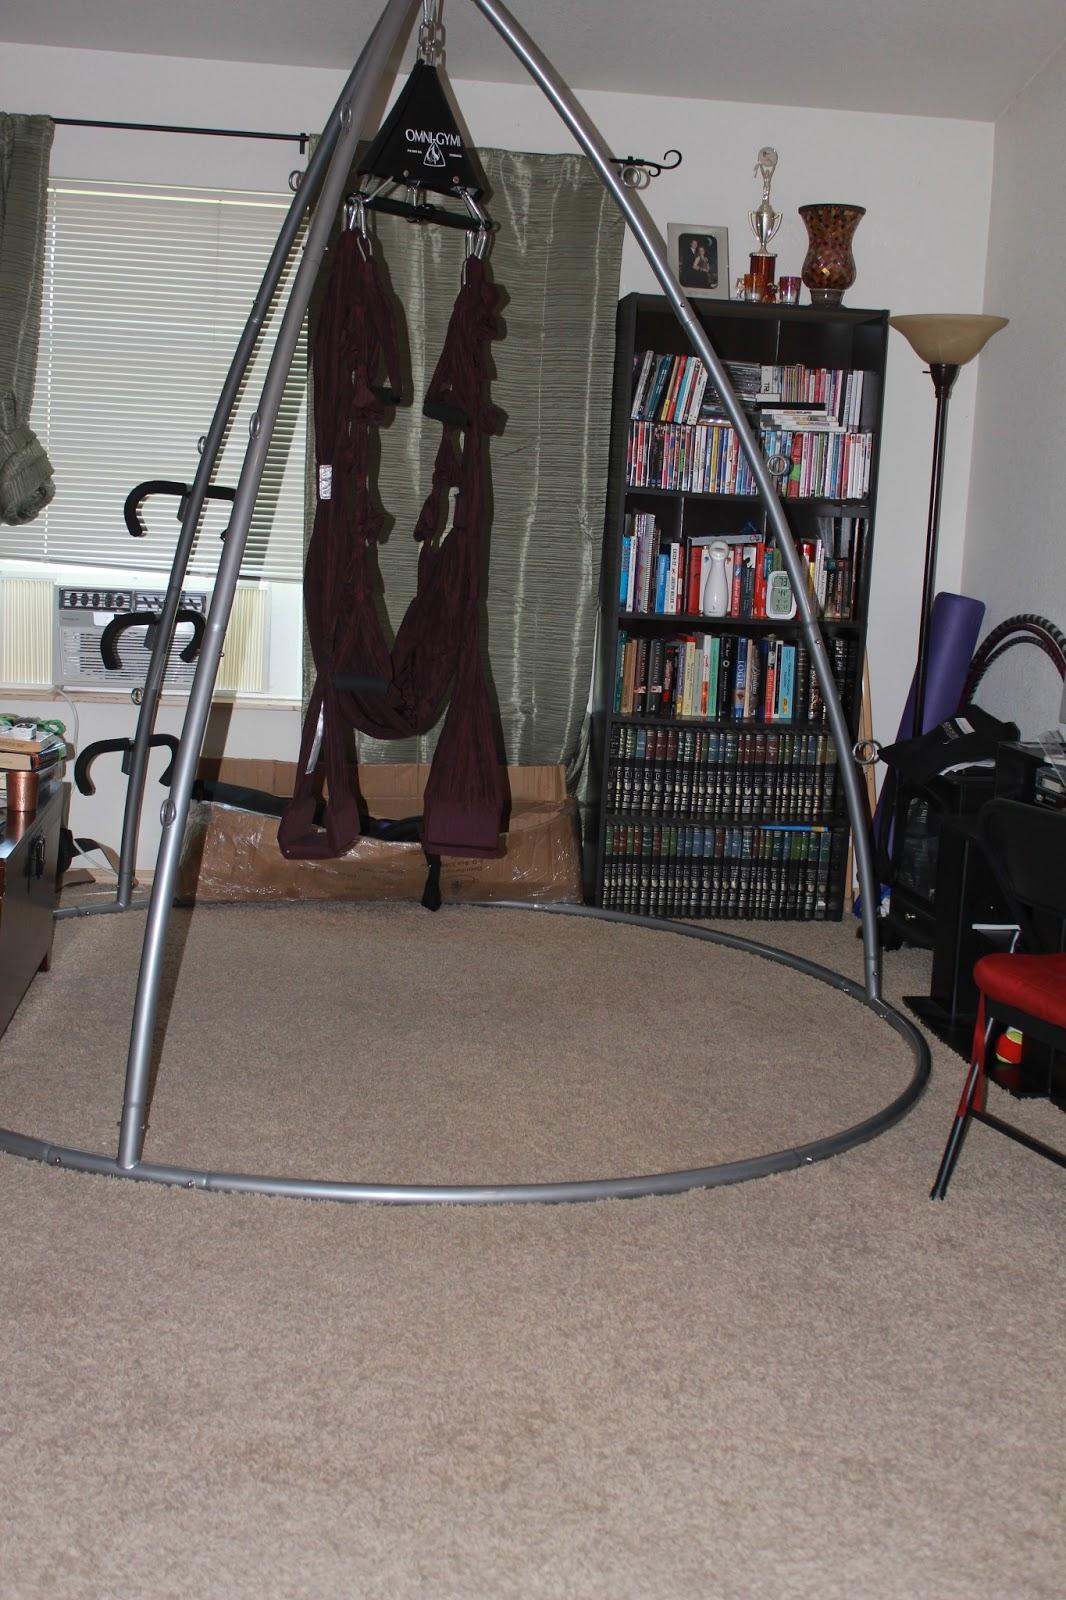 omni gym aerial yoga and lyra  oh my   femtastic dance  omni gym aerial yoga and lyra  oh my    rh   femtasticdance blogspot